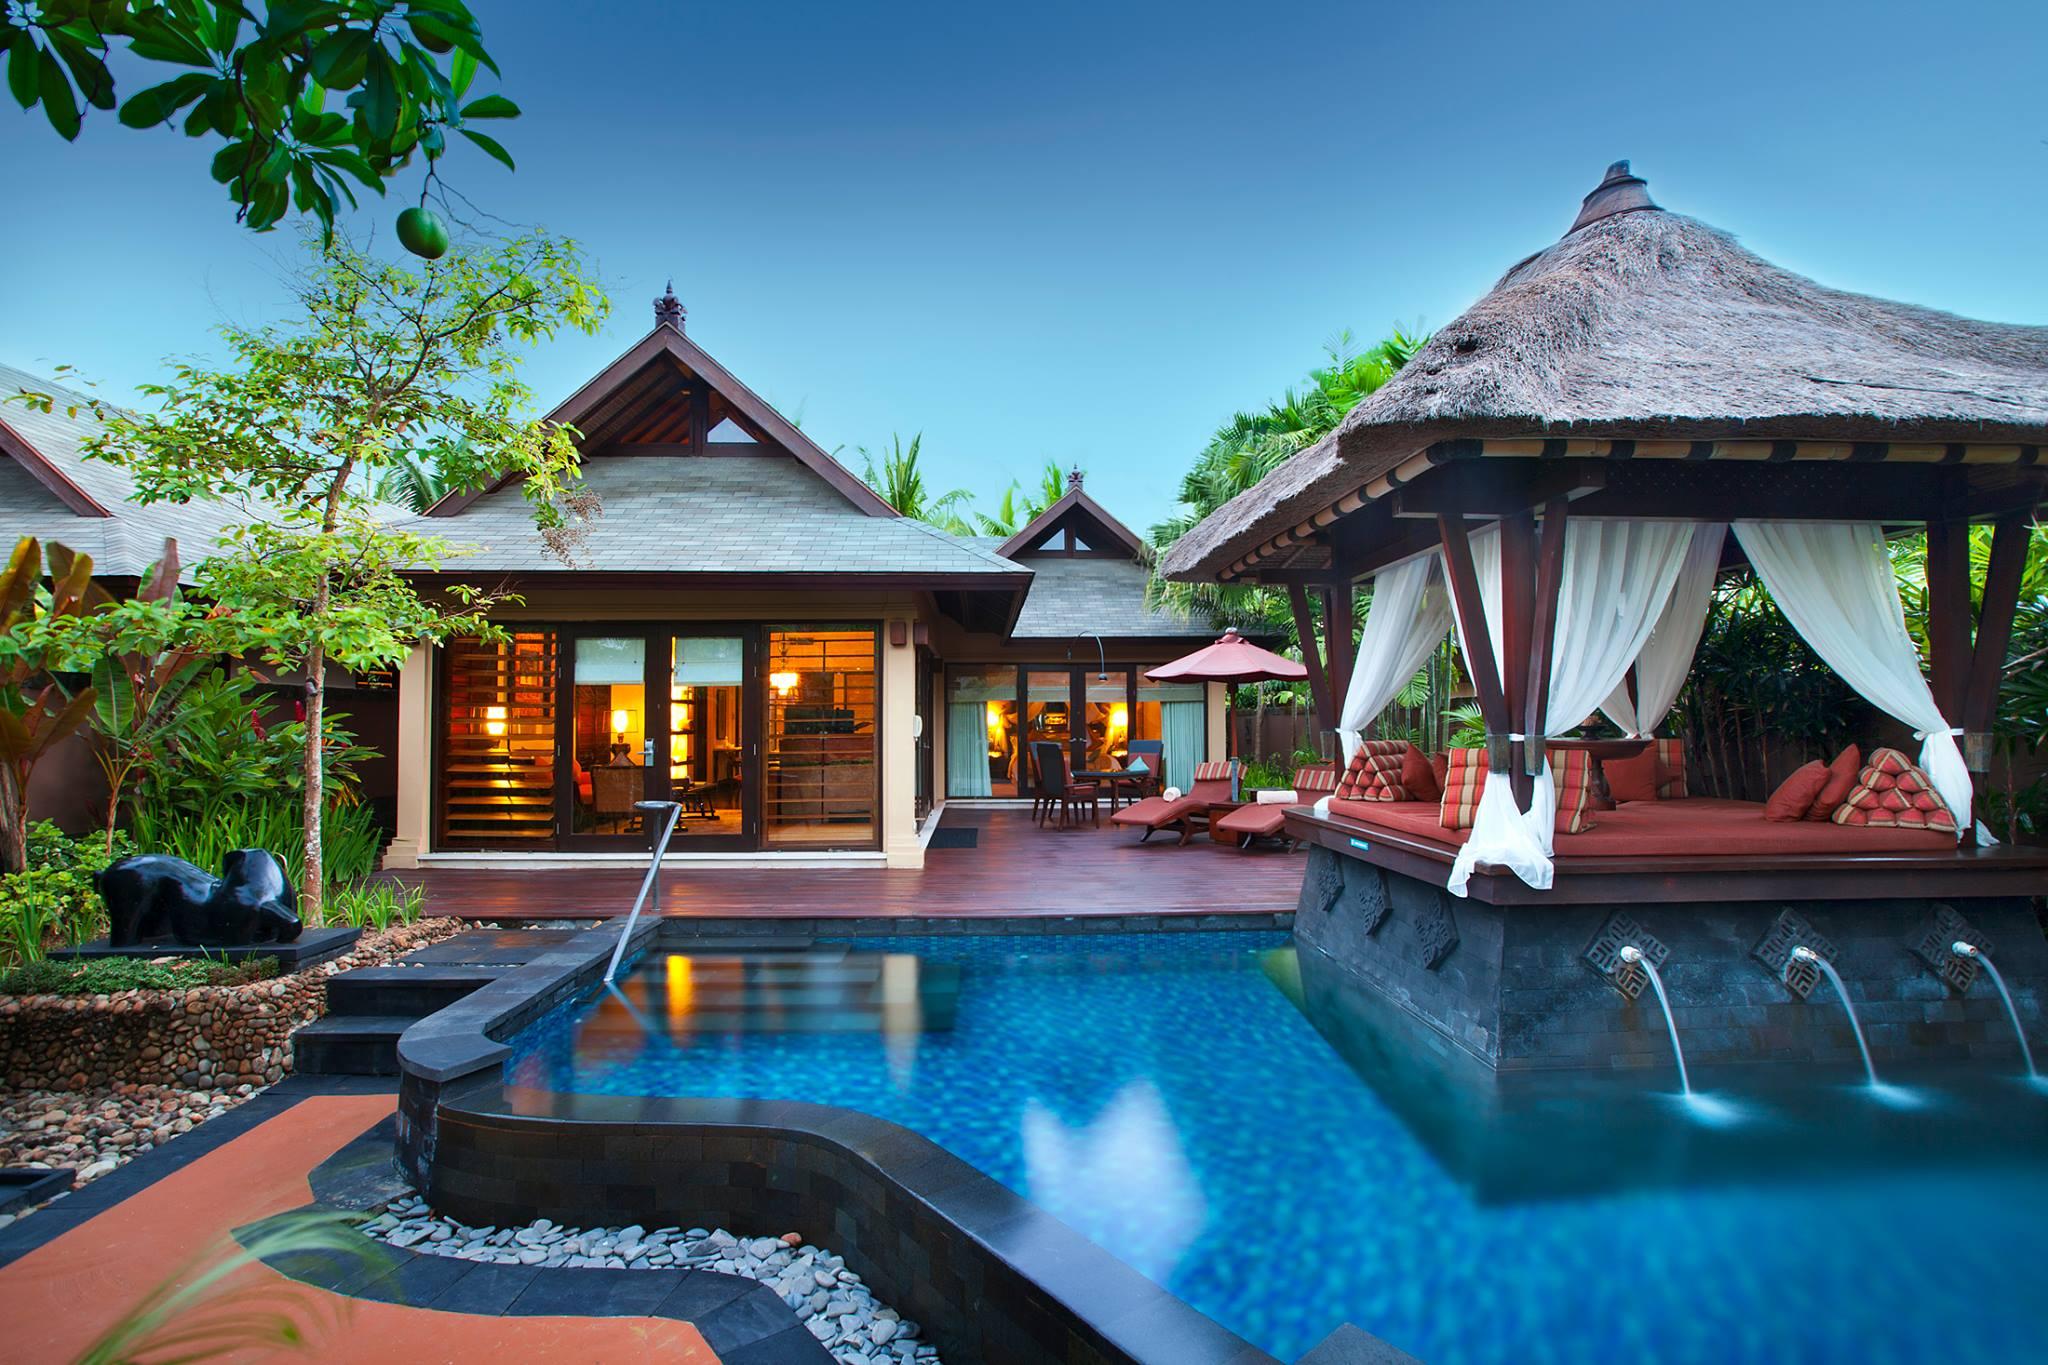 Photo of تور بالی اندونزی زمستان ۹۹ با ارزان ترین قیمت بازار خریداری کنید ؟ !